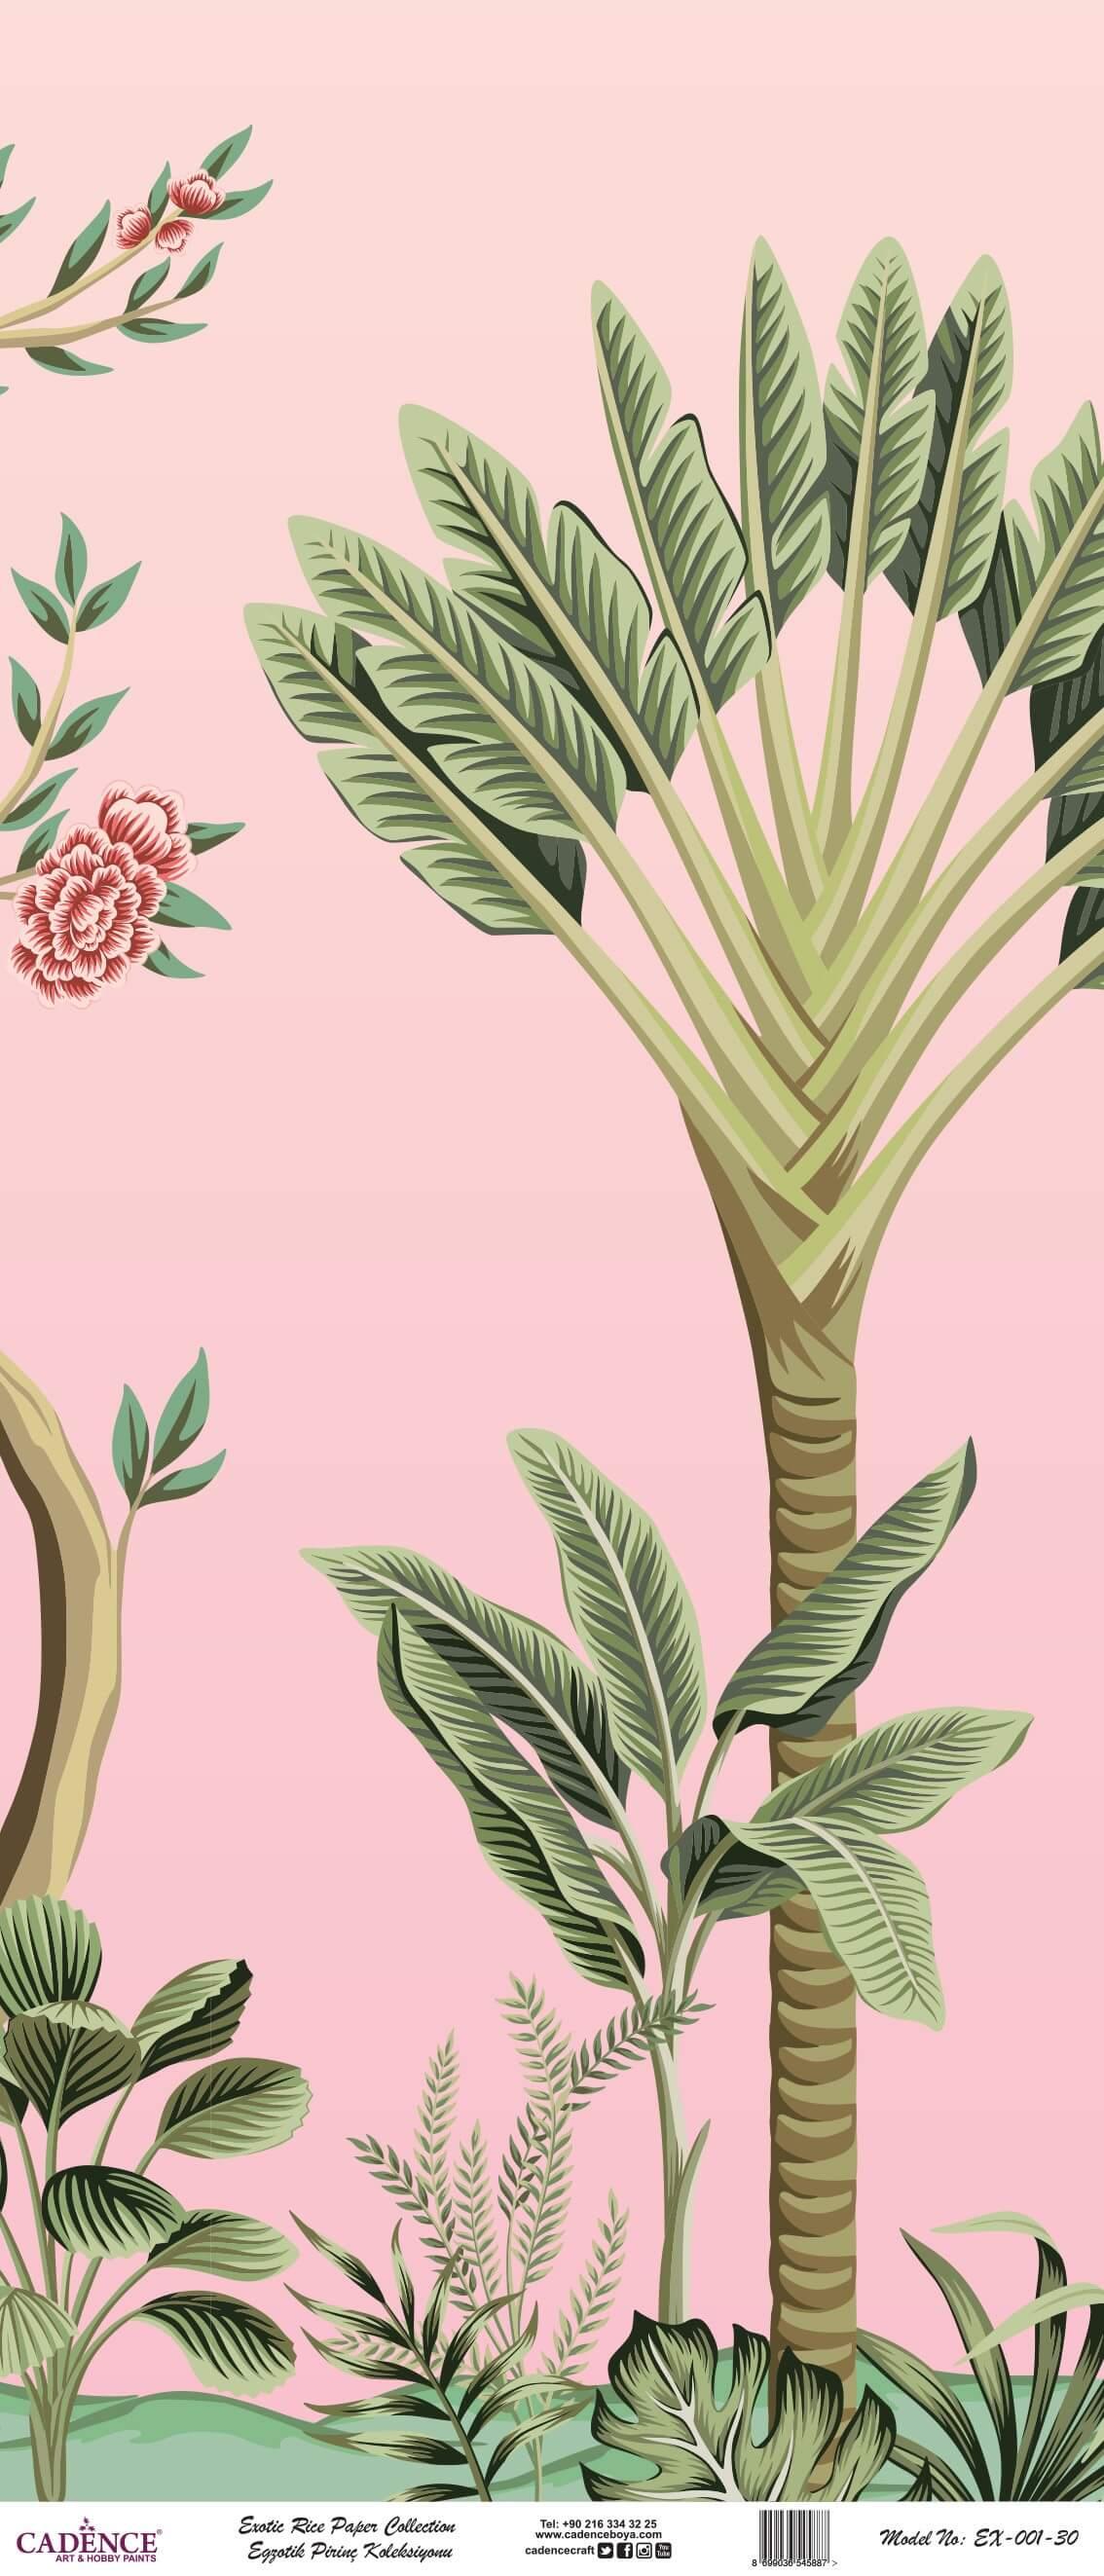 Cadence Egzotik Desen Pirinç Dekopaj | Cadence Duvar Kağıtları | Cadence Sanatsal Pirinç